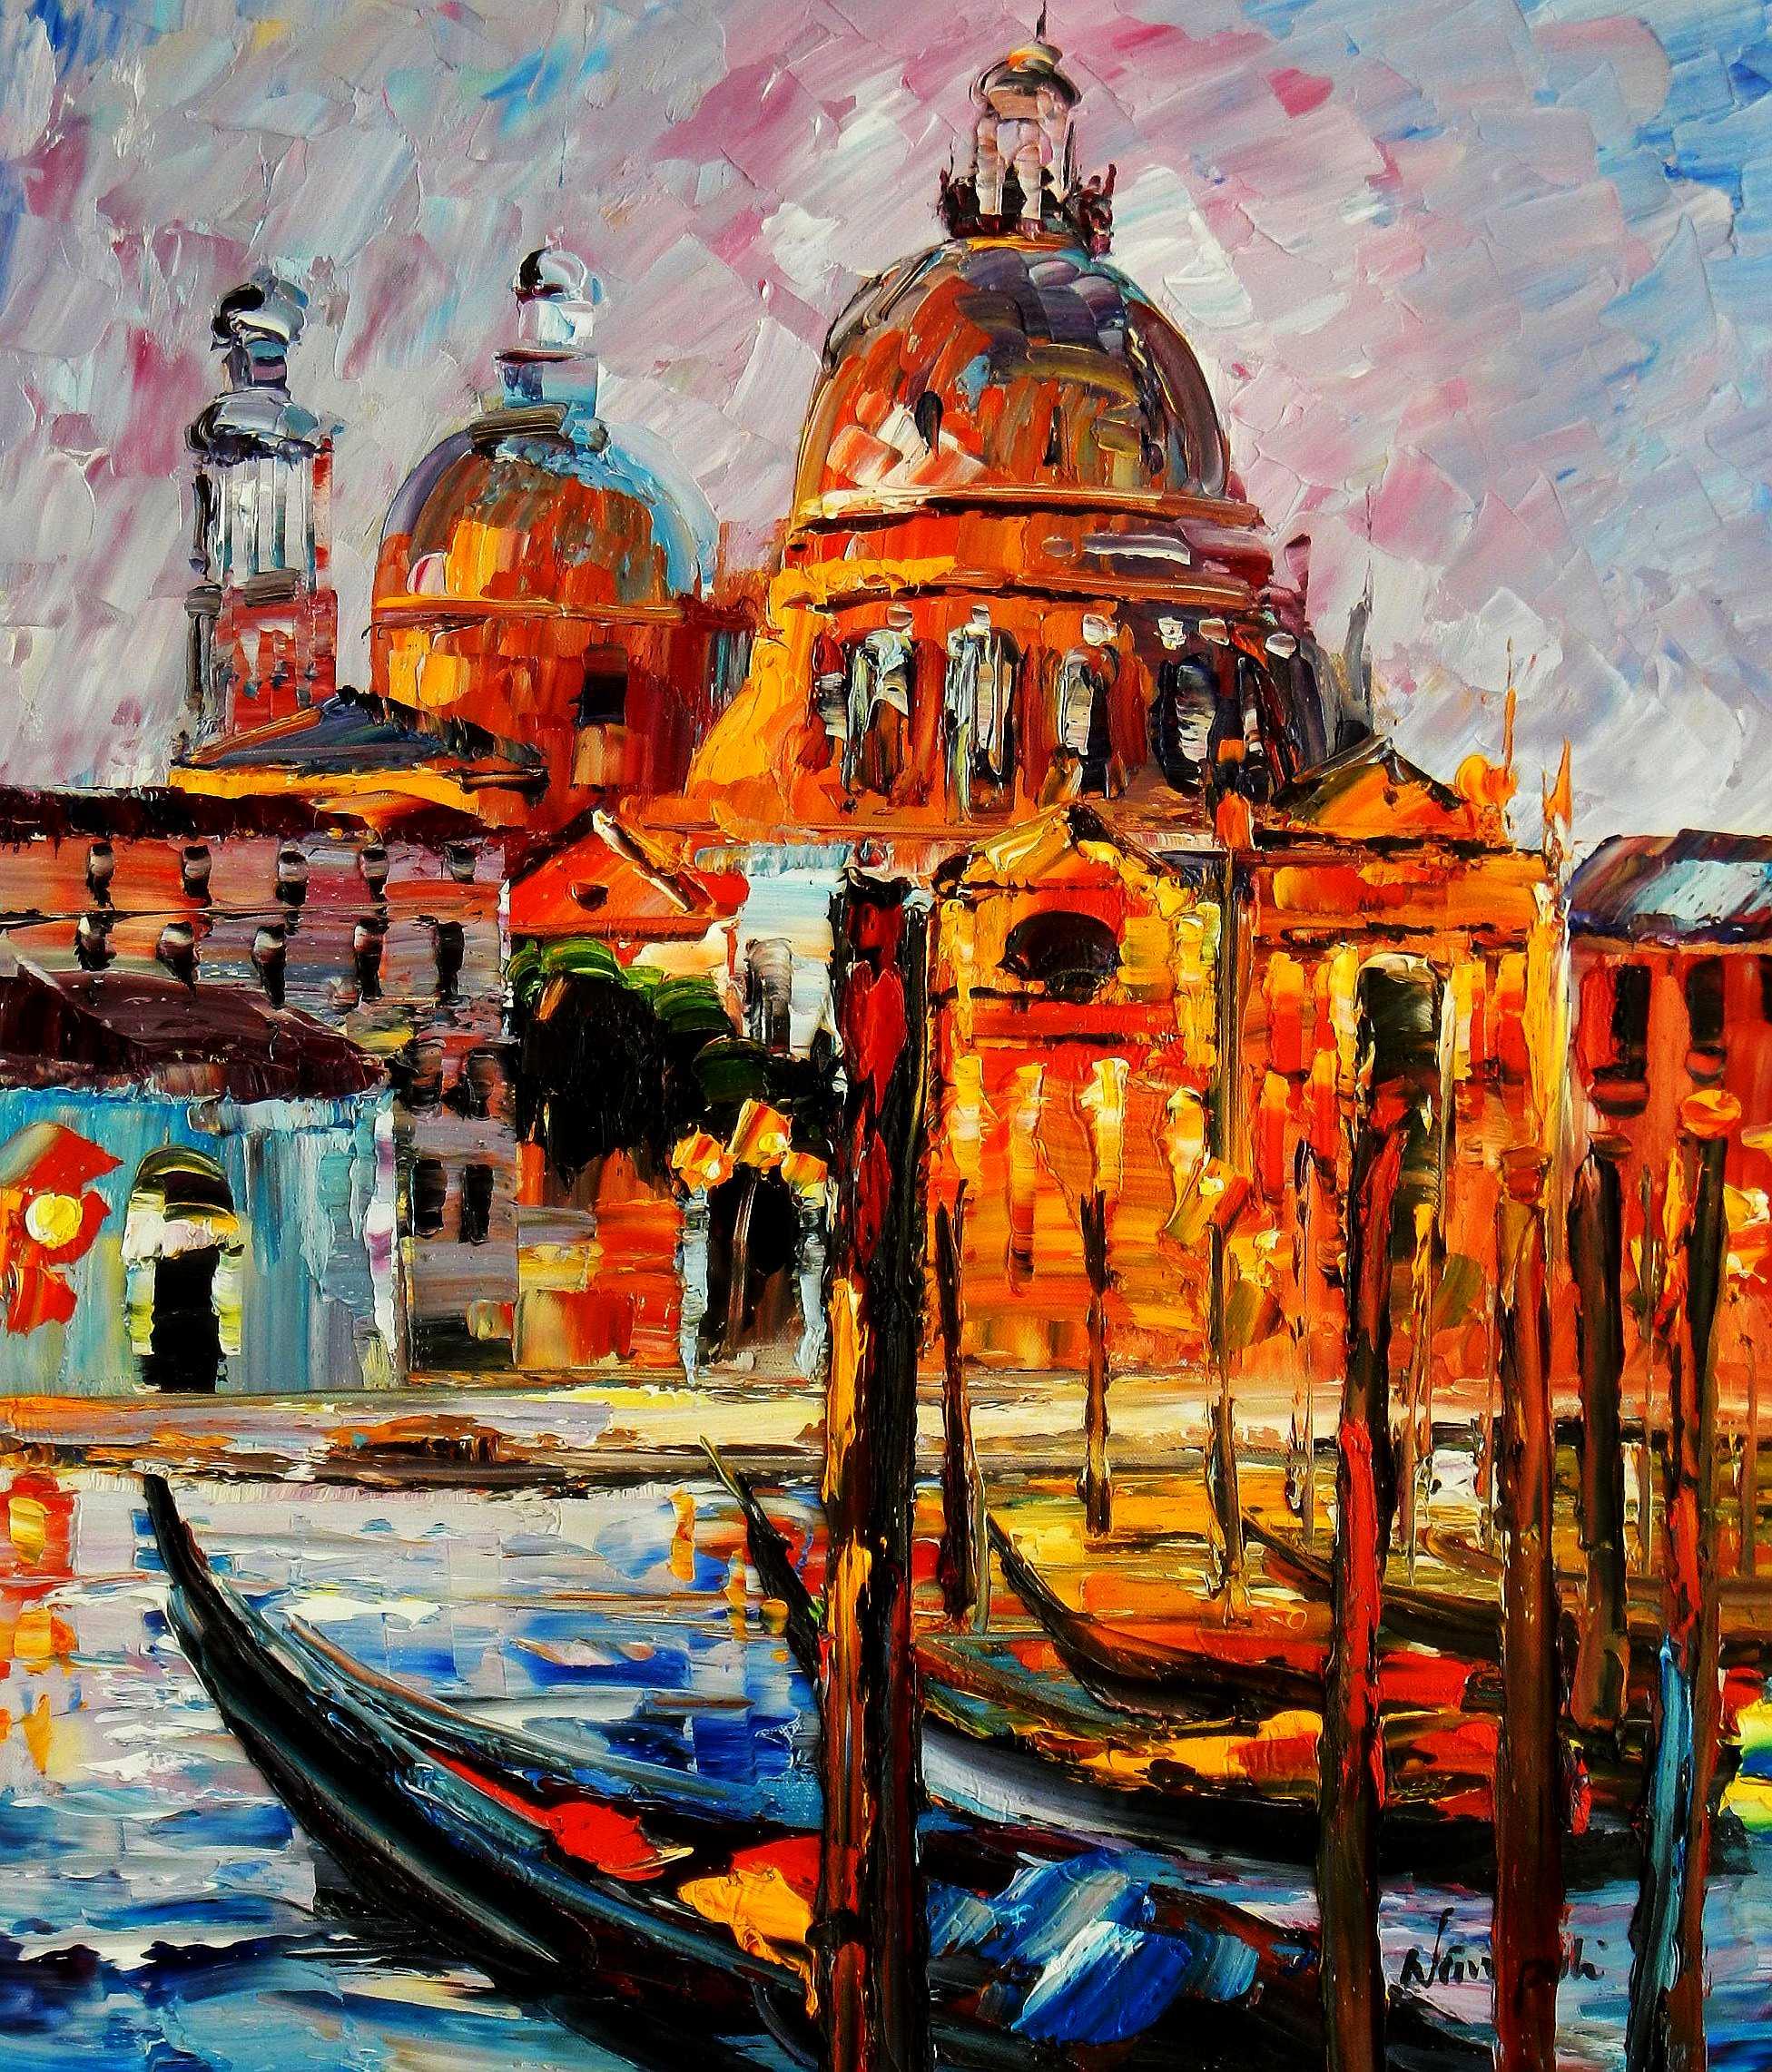 Modern Art - Venedig Canale Grande c94807 50x60cm handgemaltes Gemälde